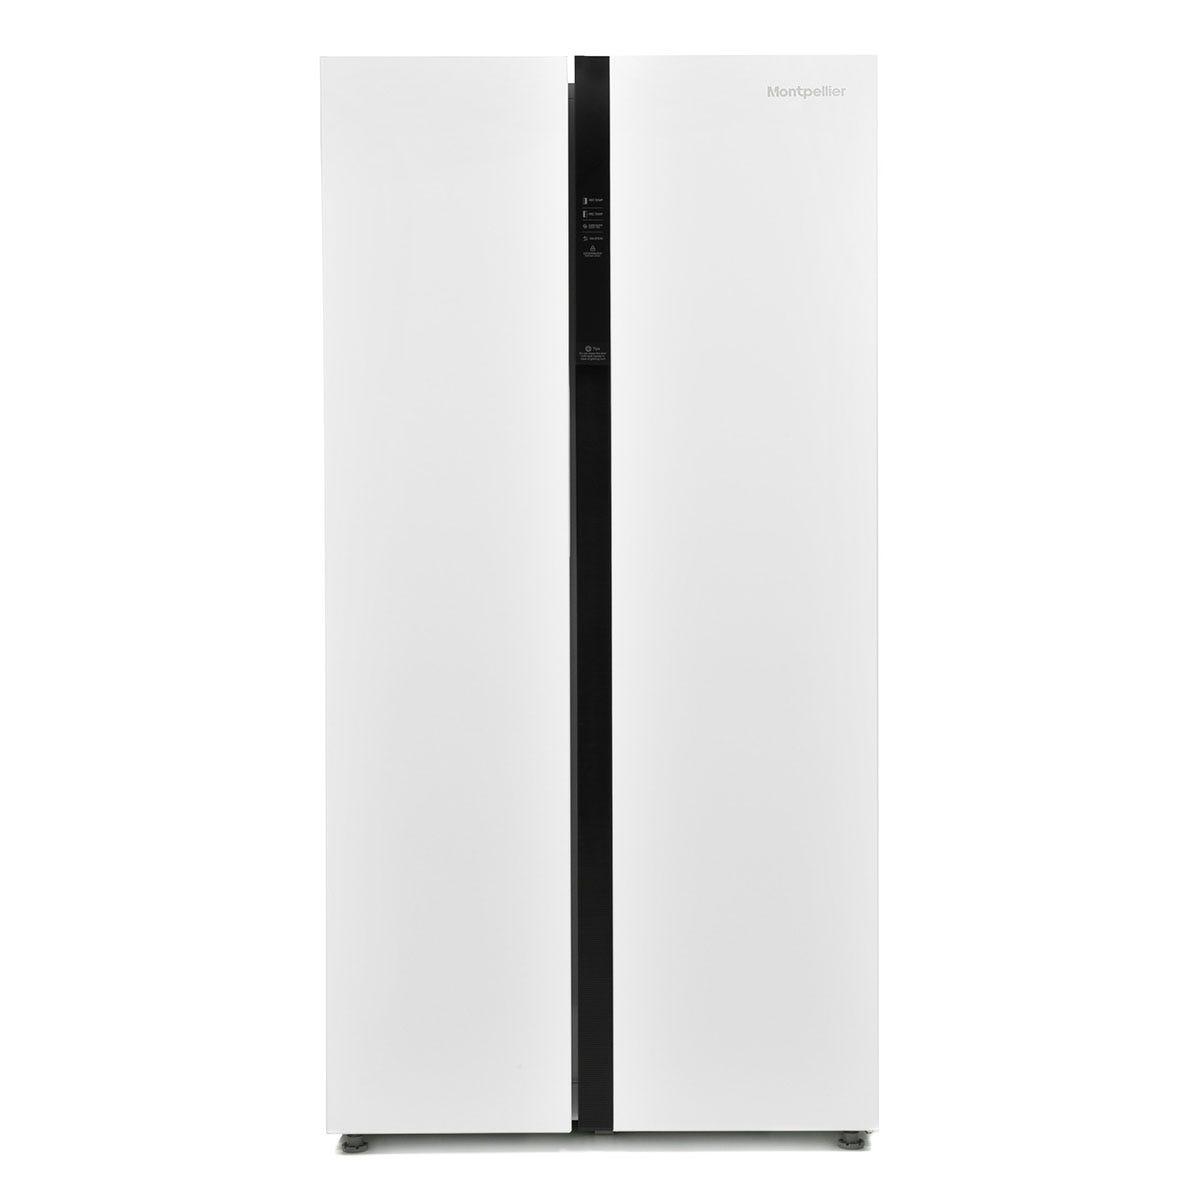 Montpellier M510BW American-Style Side-by-Side Fridge Freezer - White